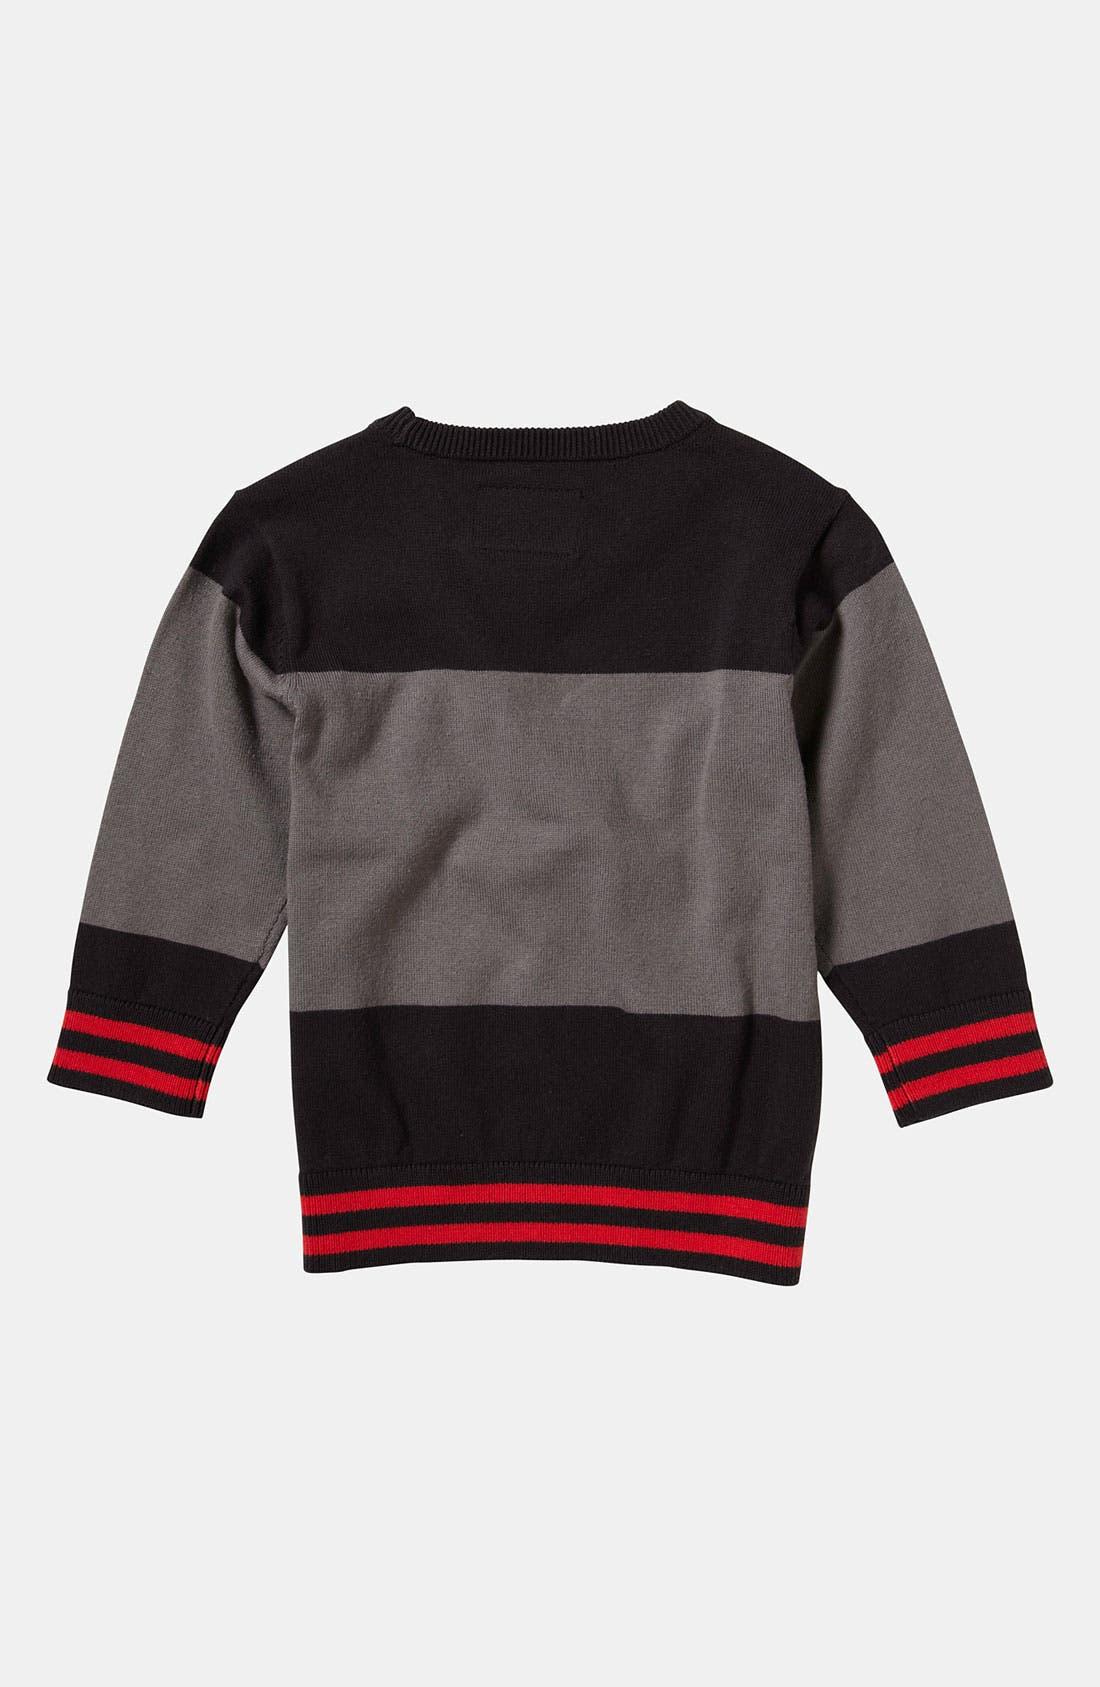 Alternate Image 2  - Quiksilver 'Wild Card' Sweater (Toddler)